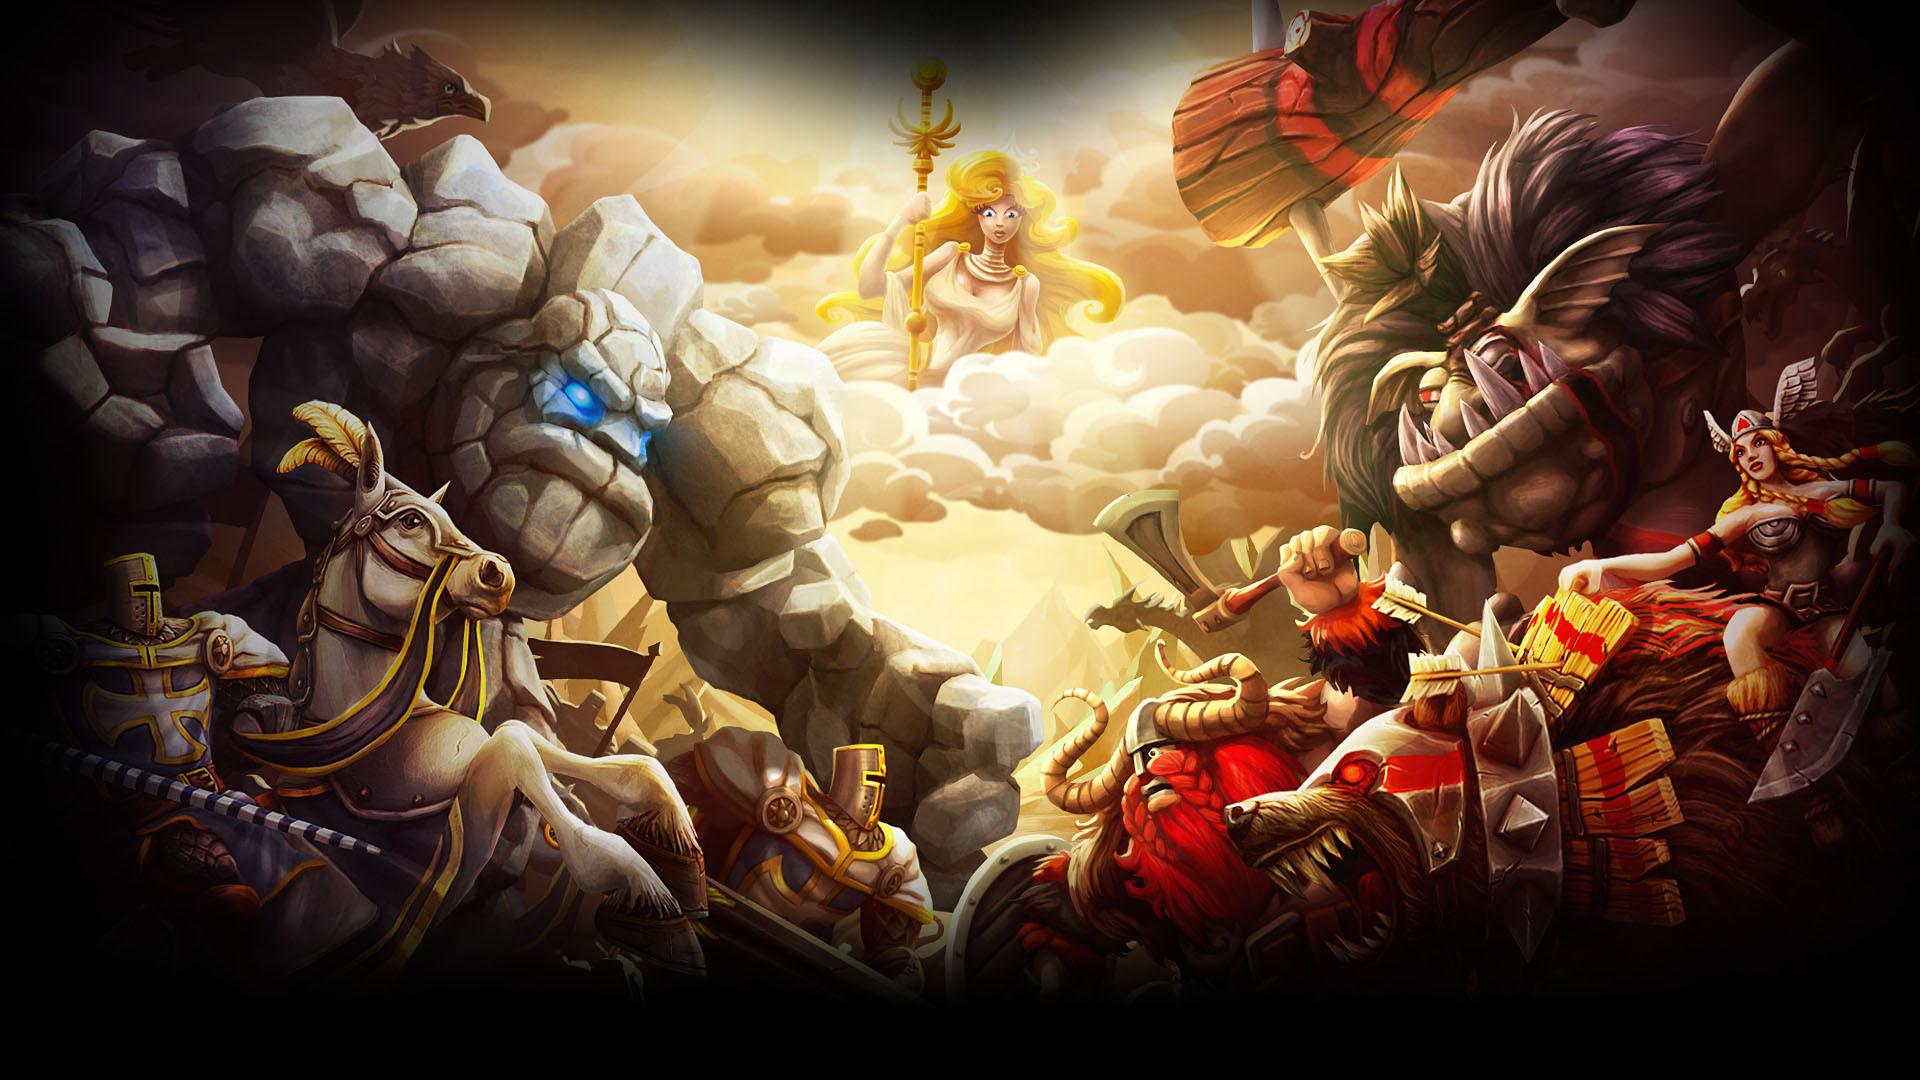 Knights Vs Vikings Steam Companion